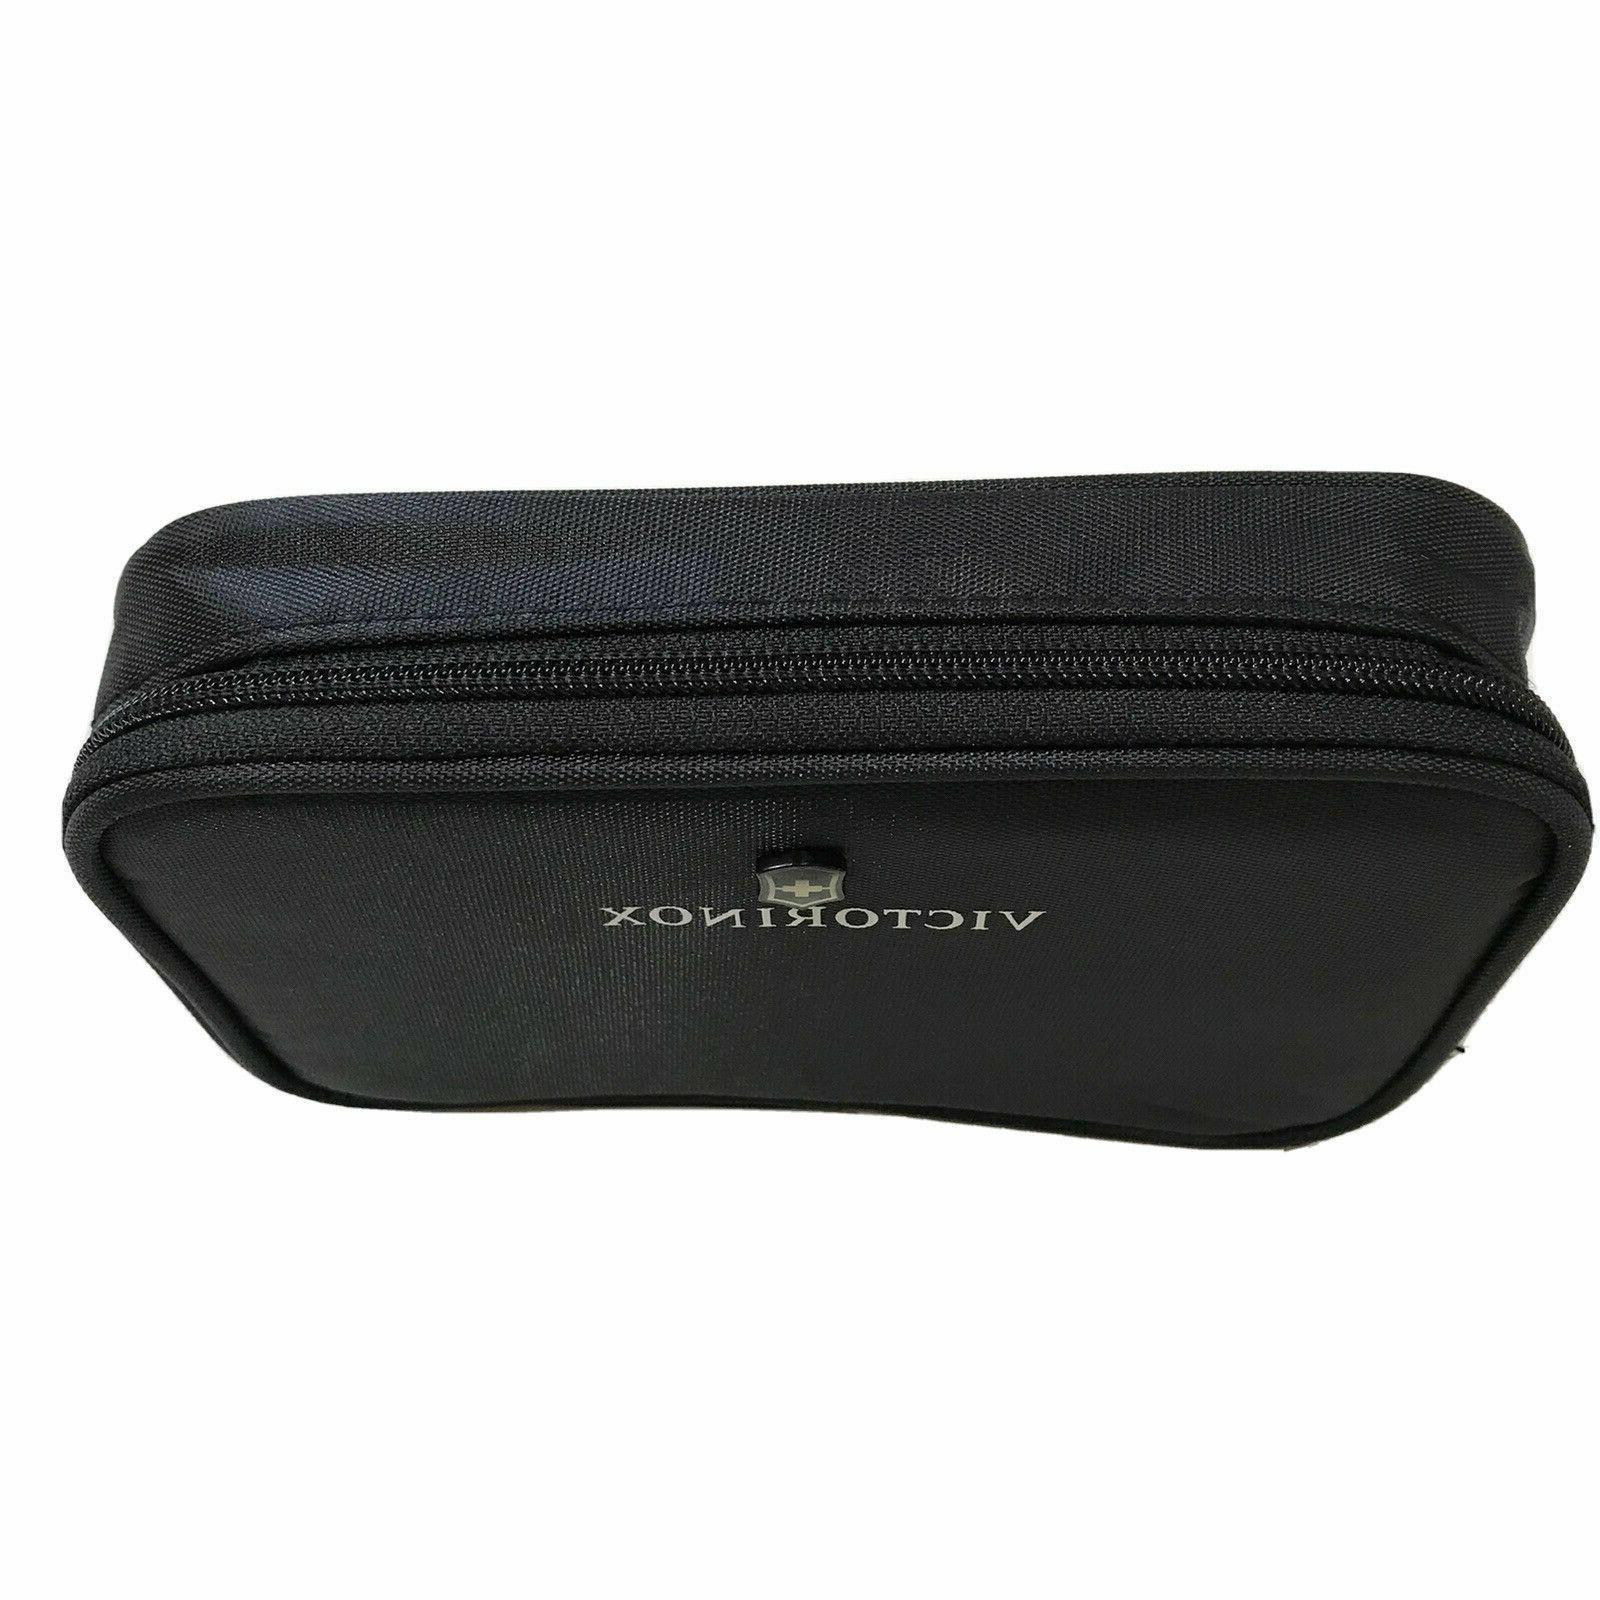 Victorinox Travel Bag Small Size Bathroom Gear